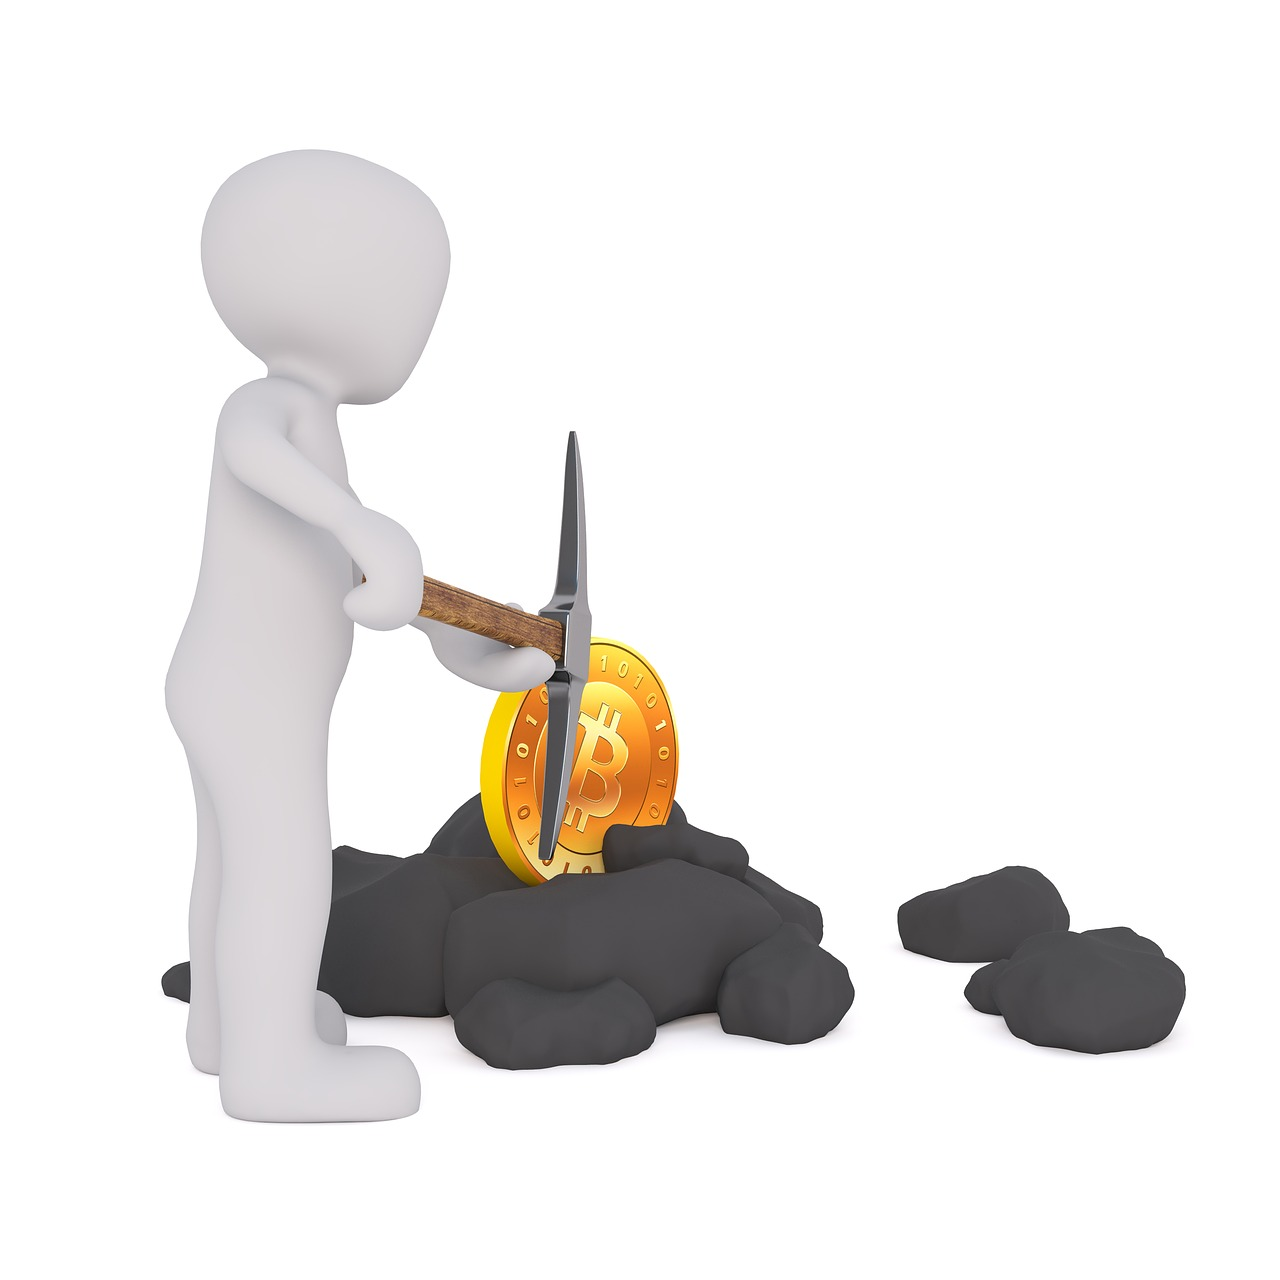 Cloud-mining di criptovalute: che cosa è?